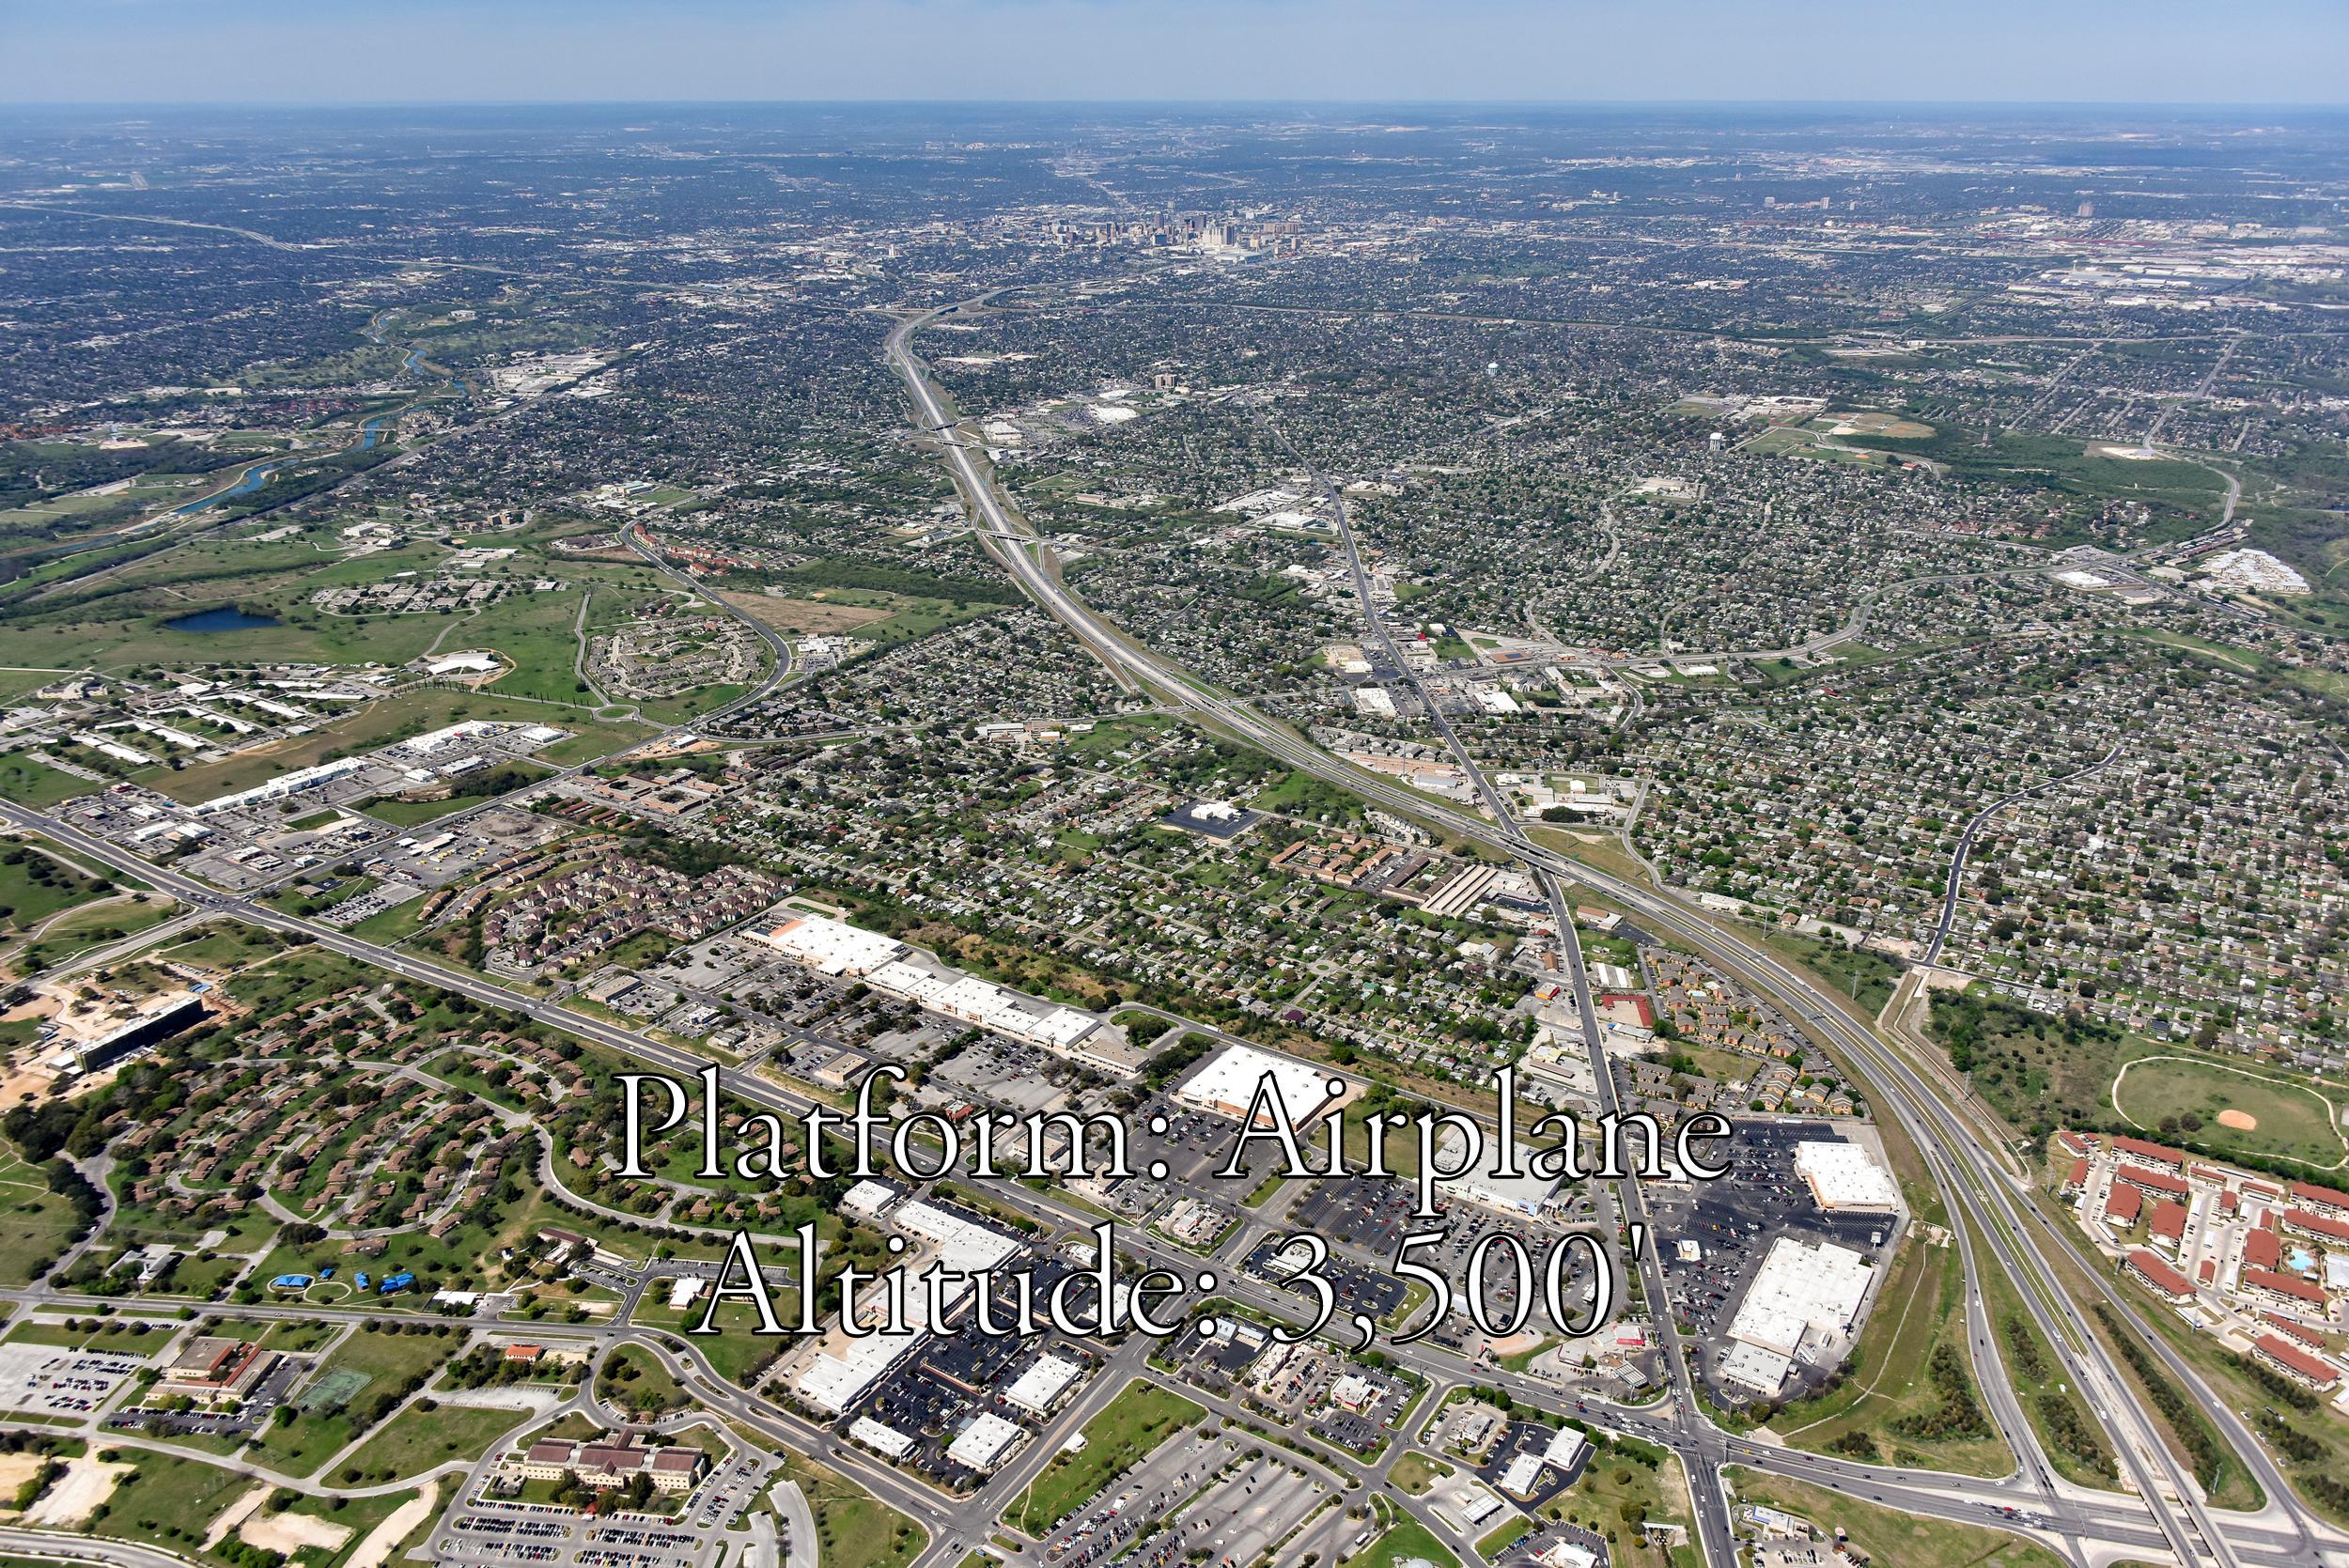 san-antonio-texas-aerial-photographer-drone-photo-image-tx-airplane-3500